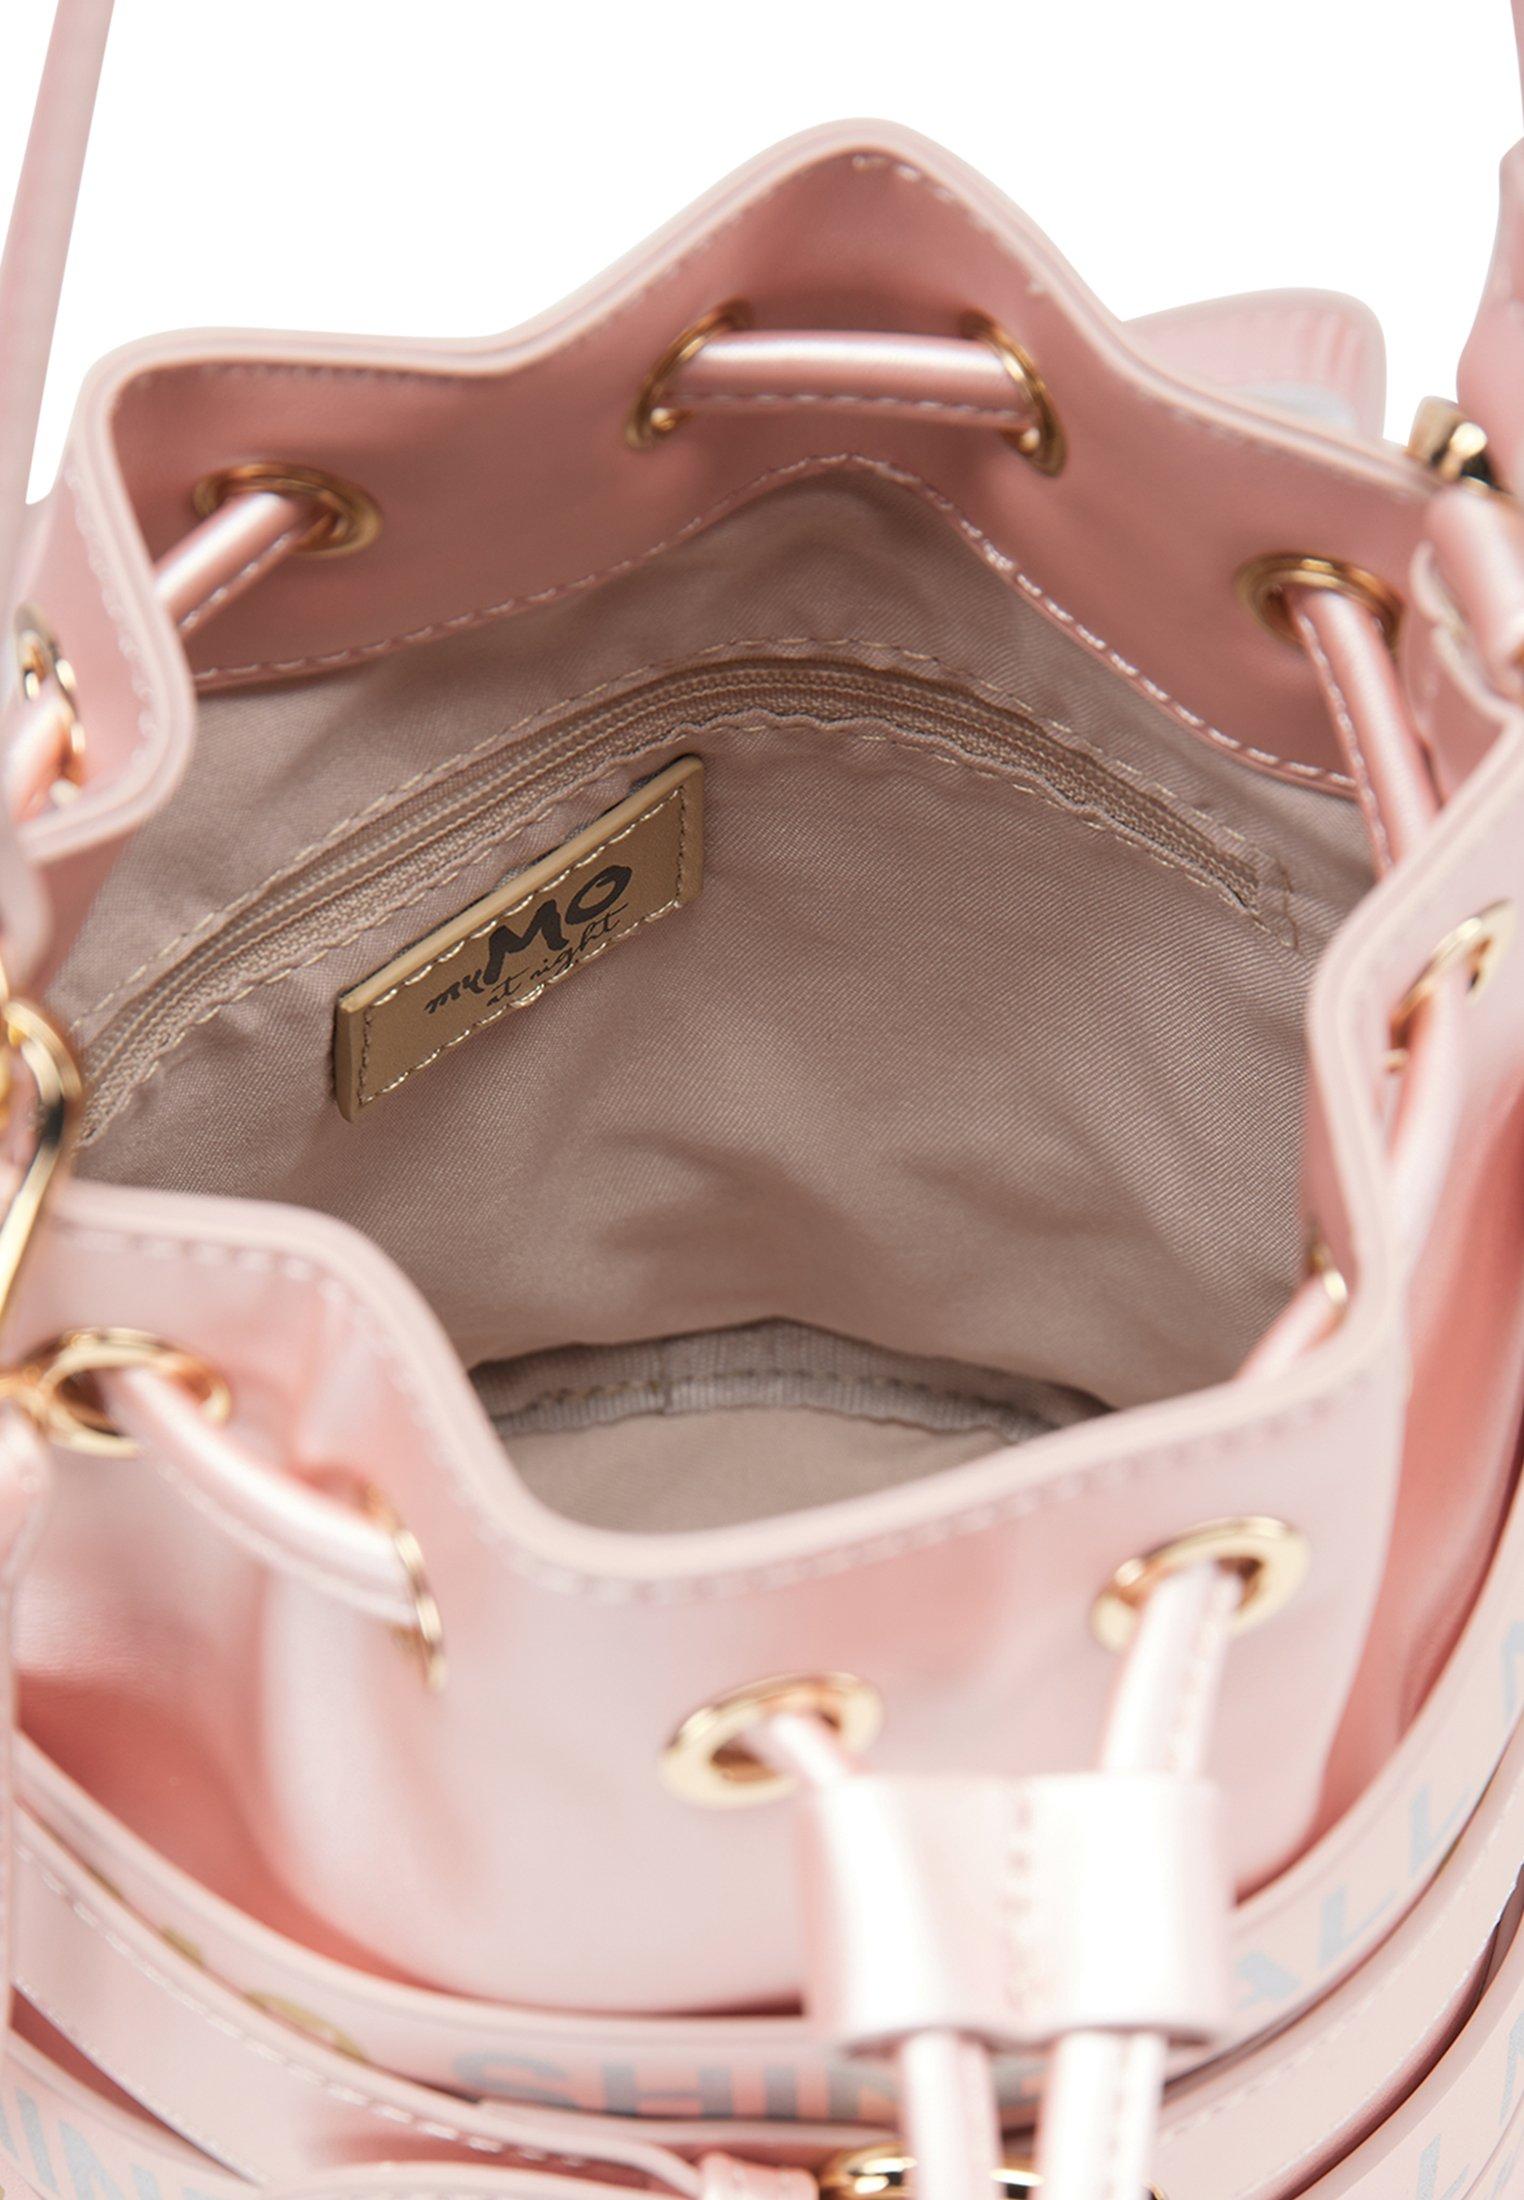 myMo Borsa a mano - rosa metallic